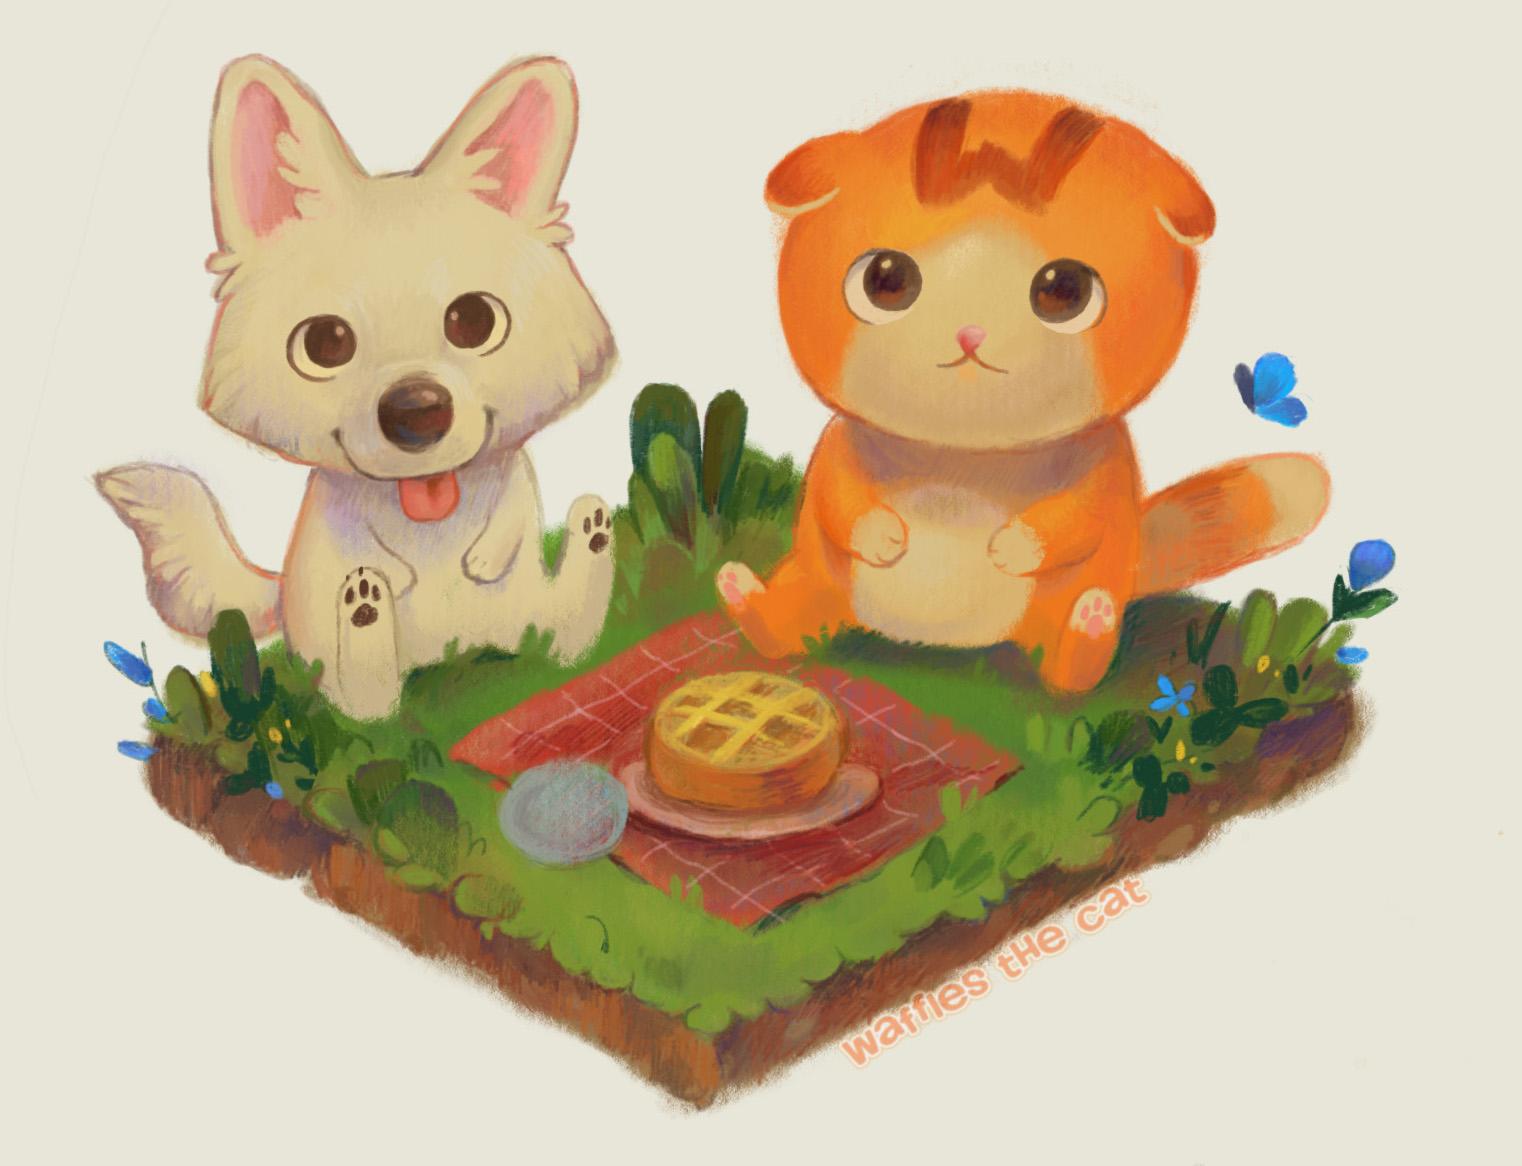 waffles_strider_picnic2.jpg